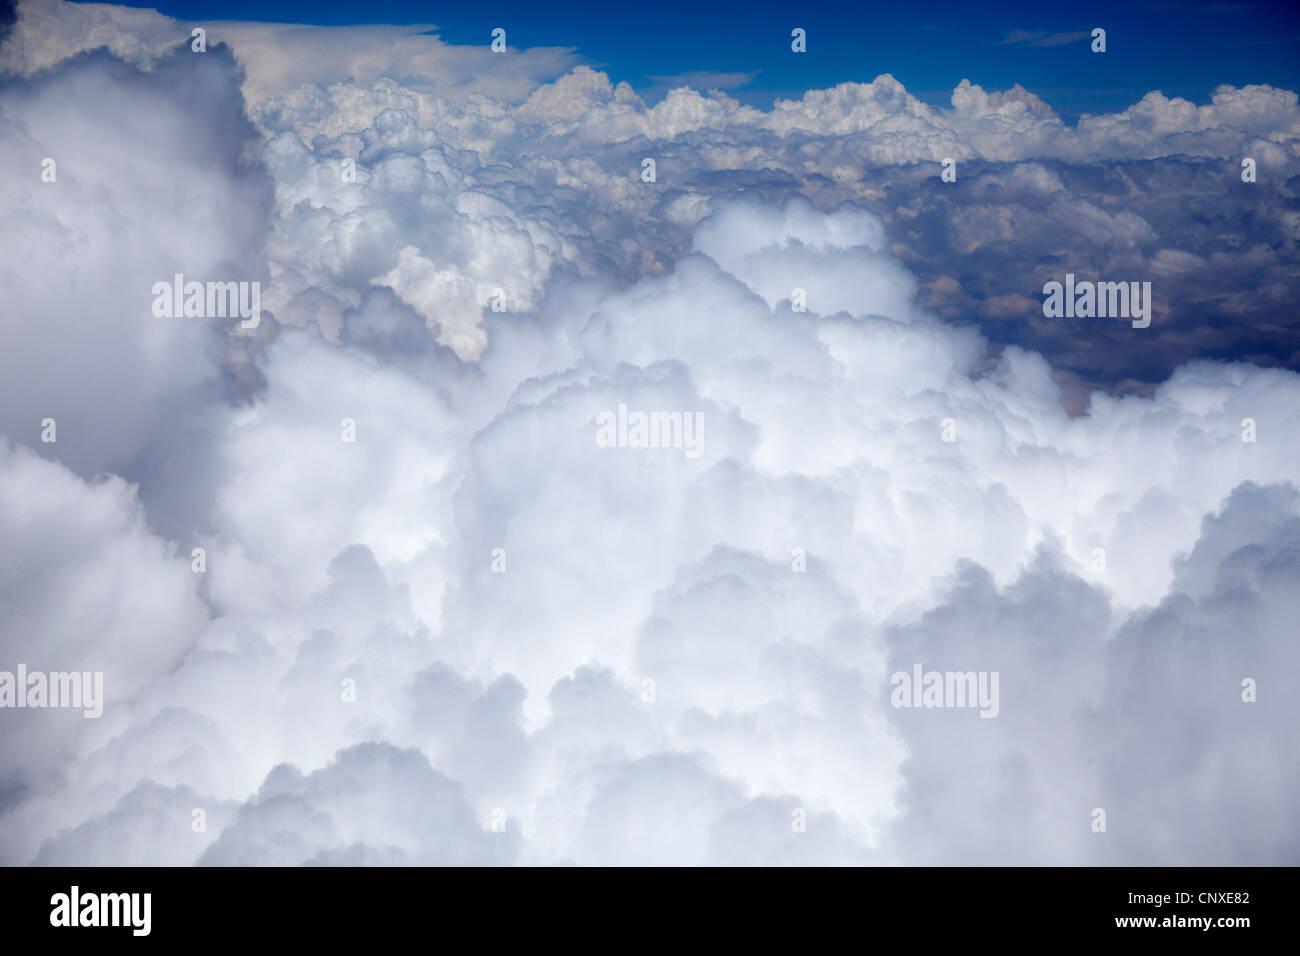 Sunlight on a cloudscape, blue sky in distance - Stock Image